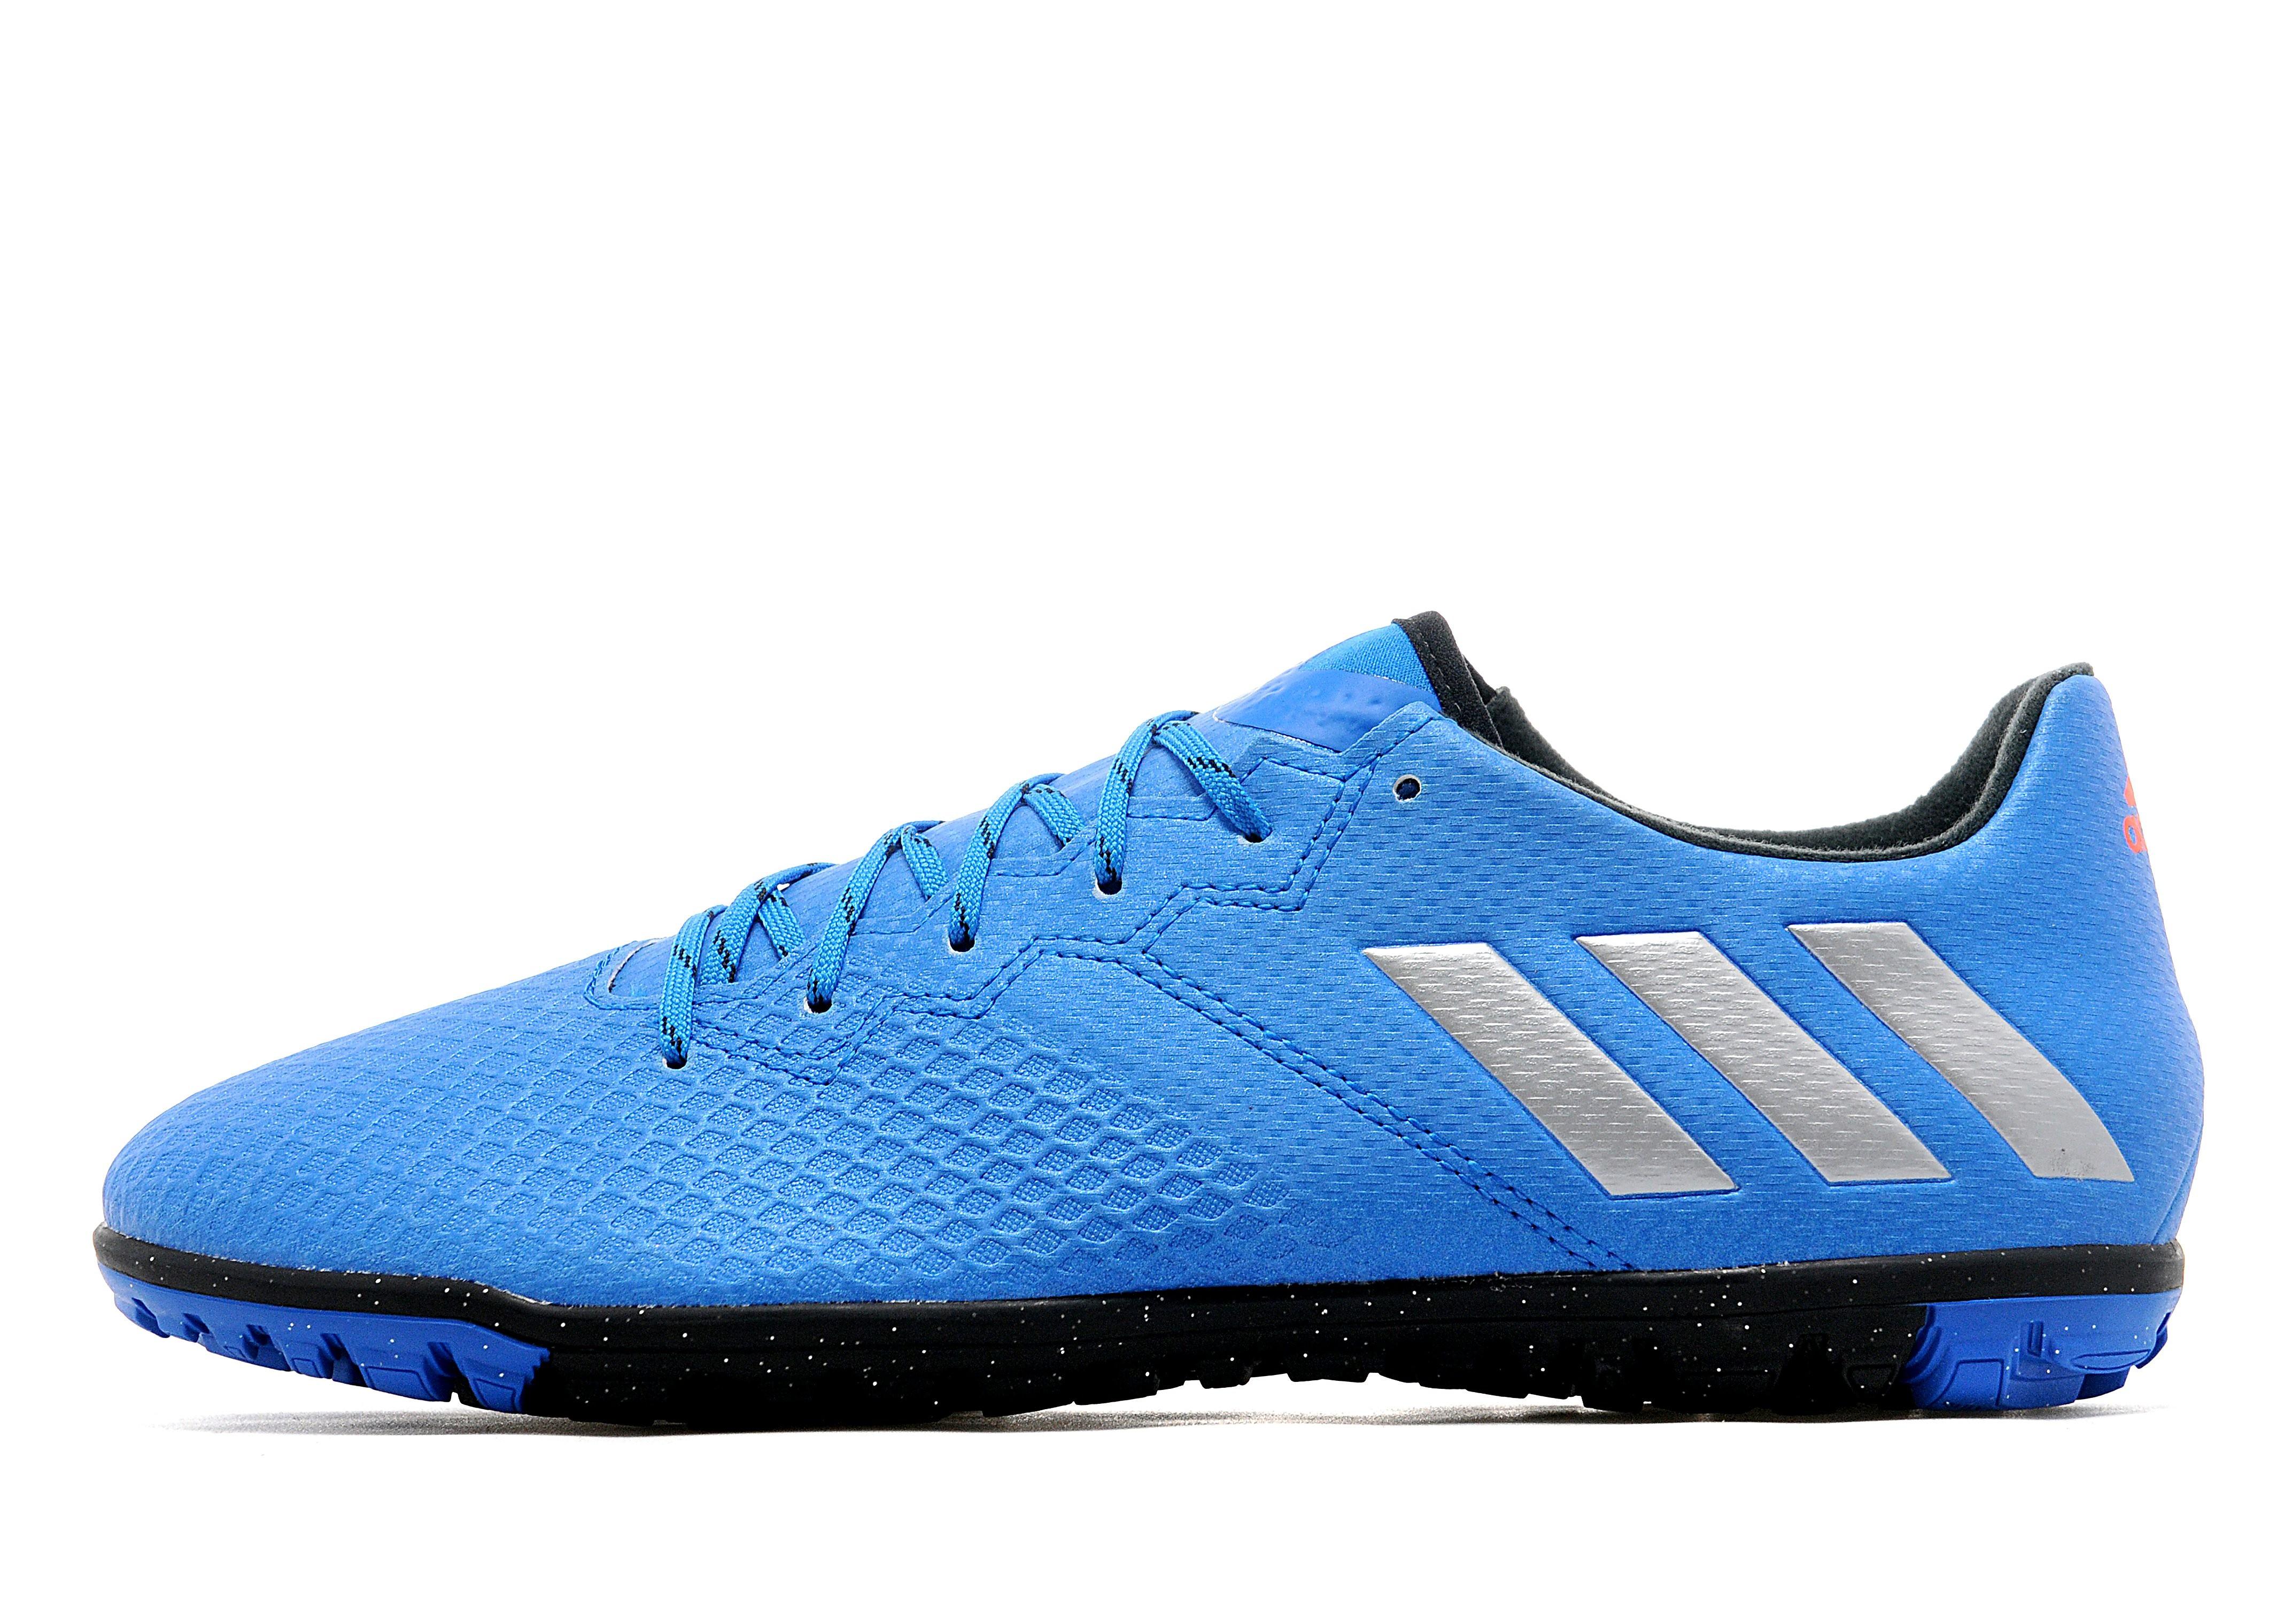 adidas Messi 16.3 Turf